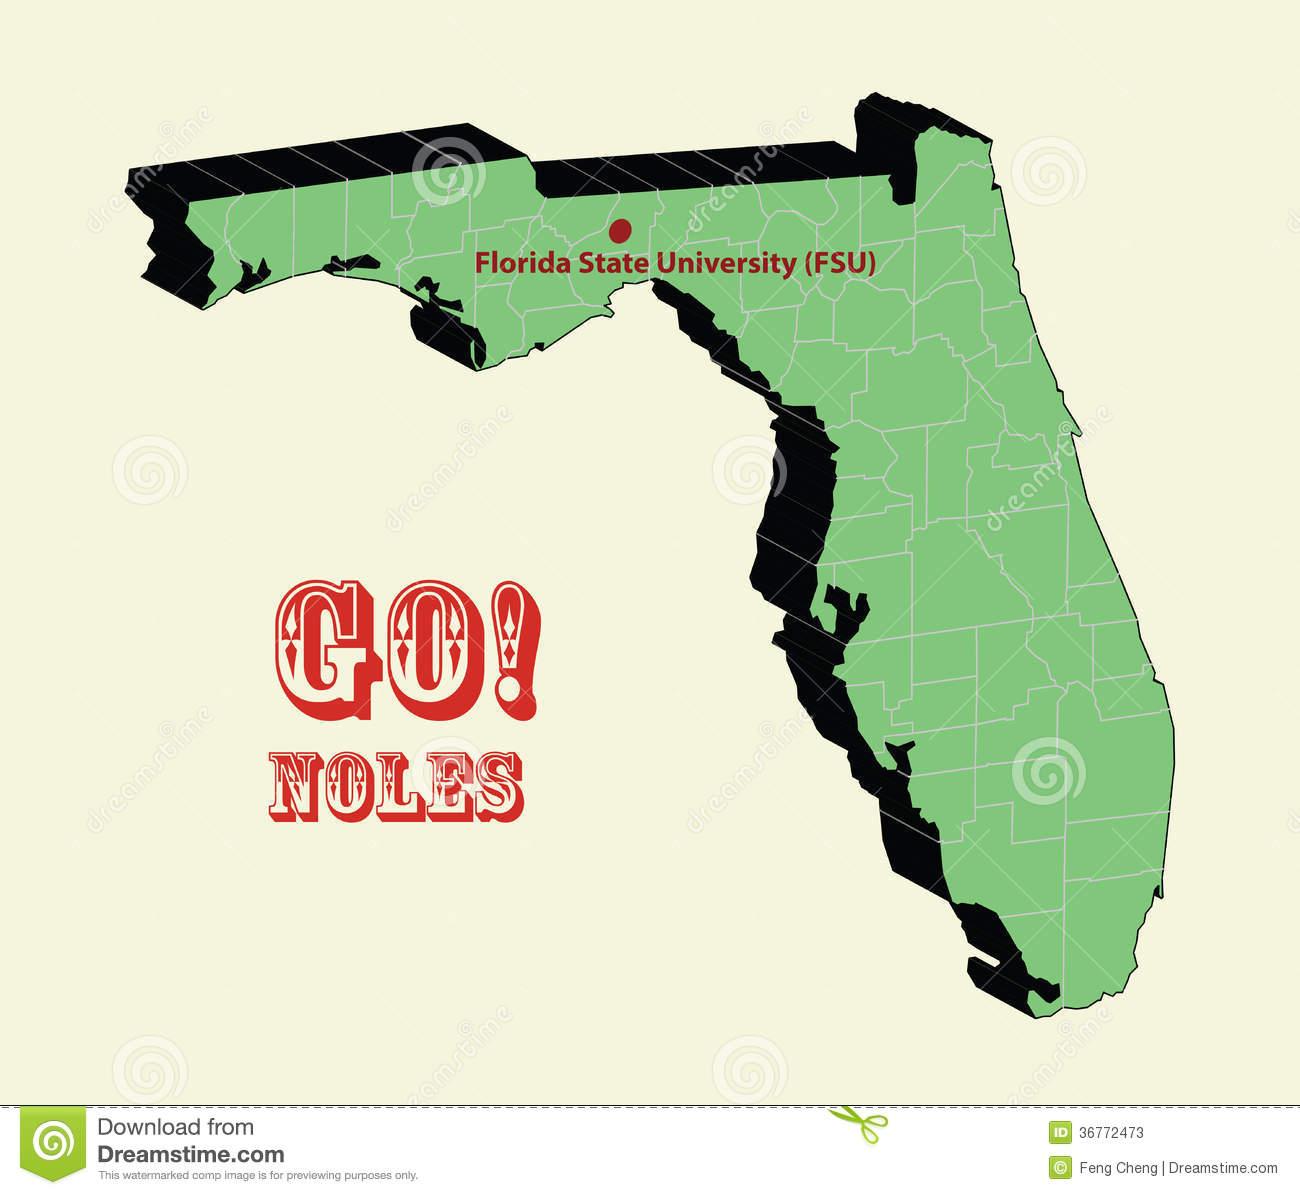 Florida state map clipart svg transparent Florida state university clipart - ClipartFest svg transparent